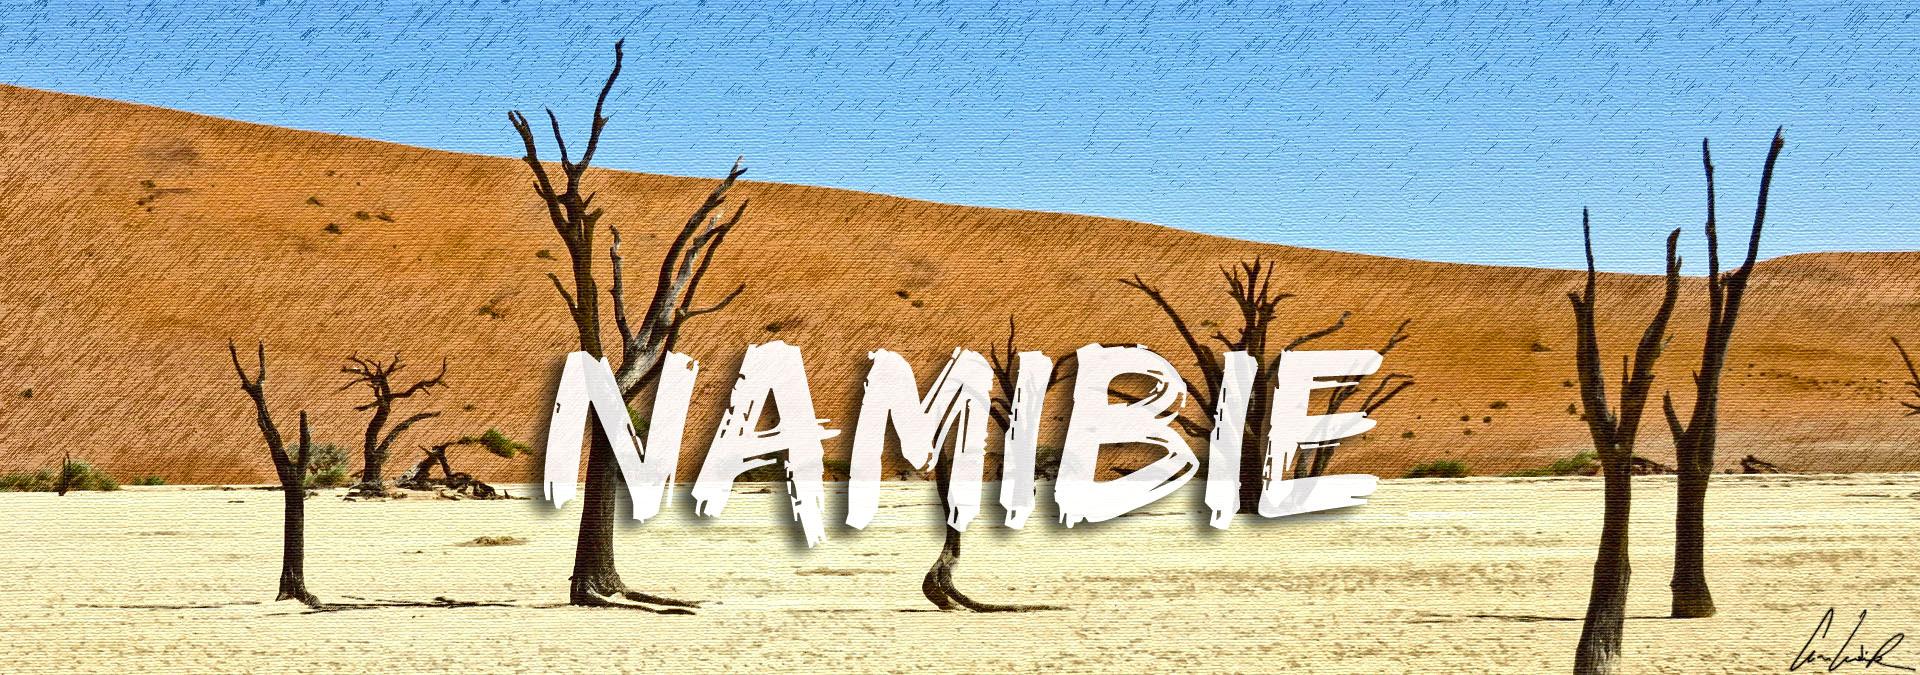 C-Ludik - Pays visité : Namibie